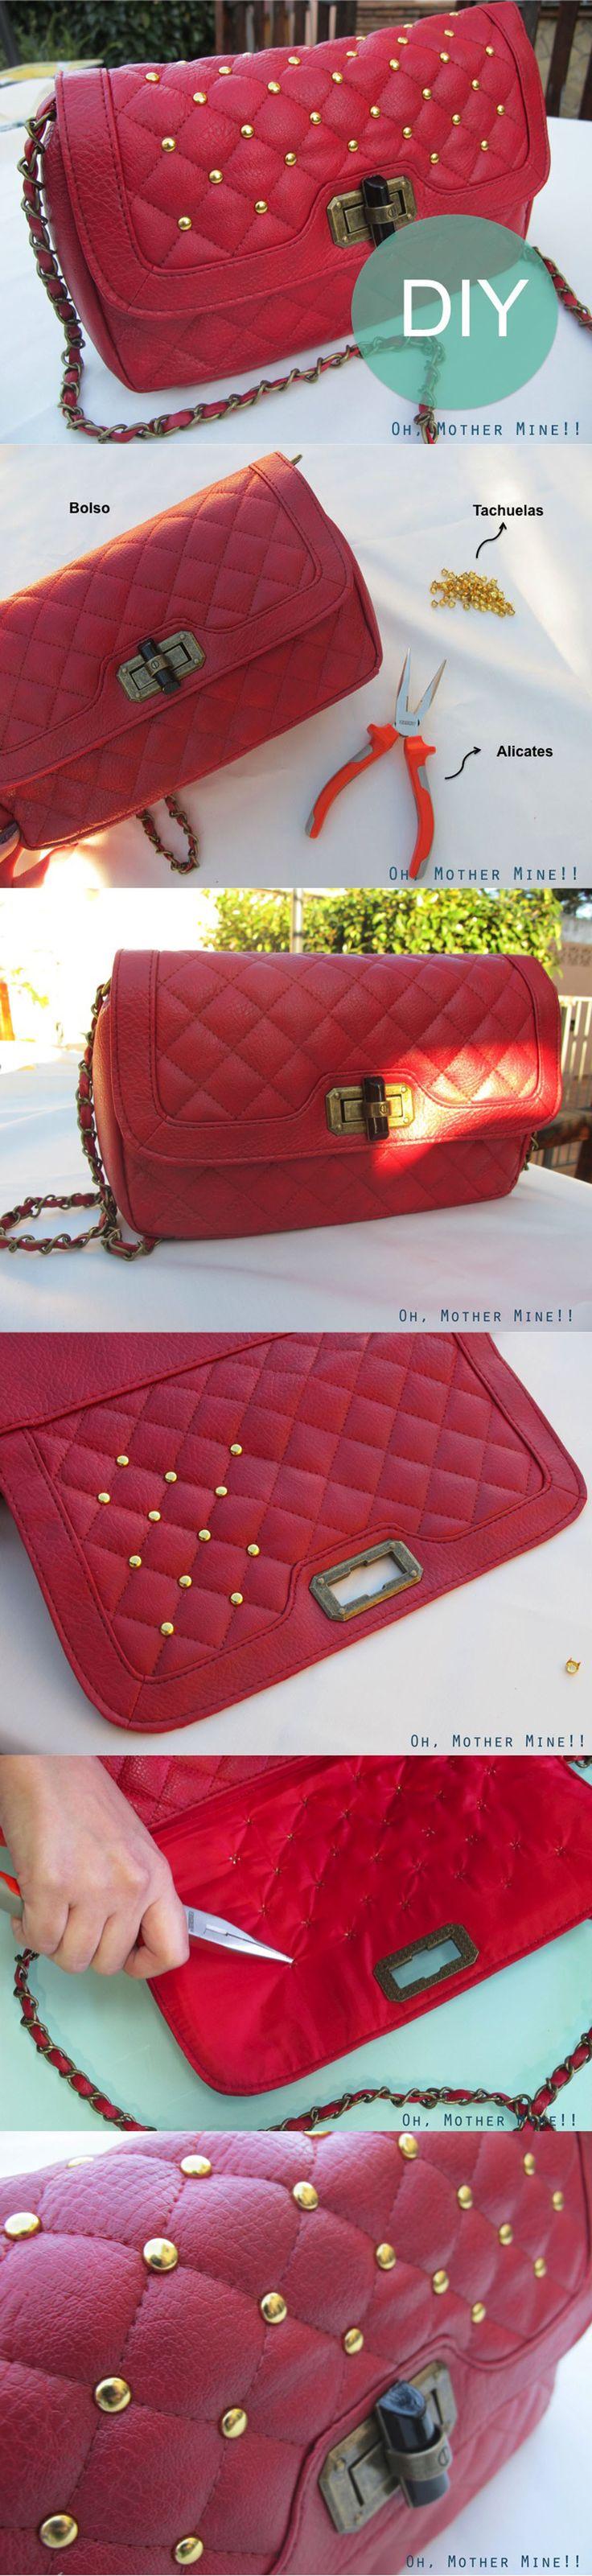 #Infografia #DIY #Bolso Vintage con tachuelas DIY Vintage Studded Handbag    http://ohmothermine.blogspot.com.es/2013/01/diy-bolso-tachuelas-vintage-diy-vintage.html